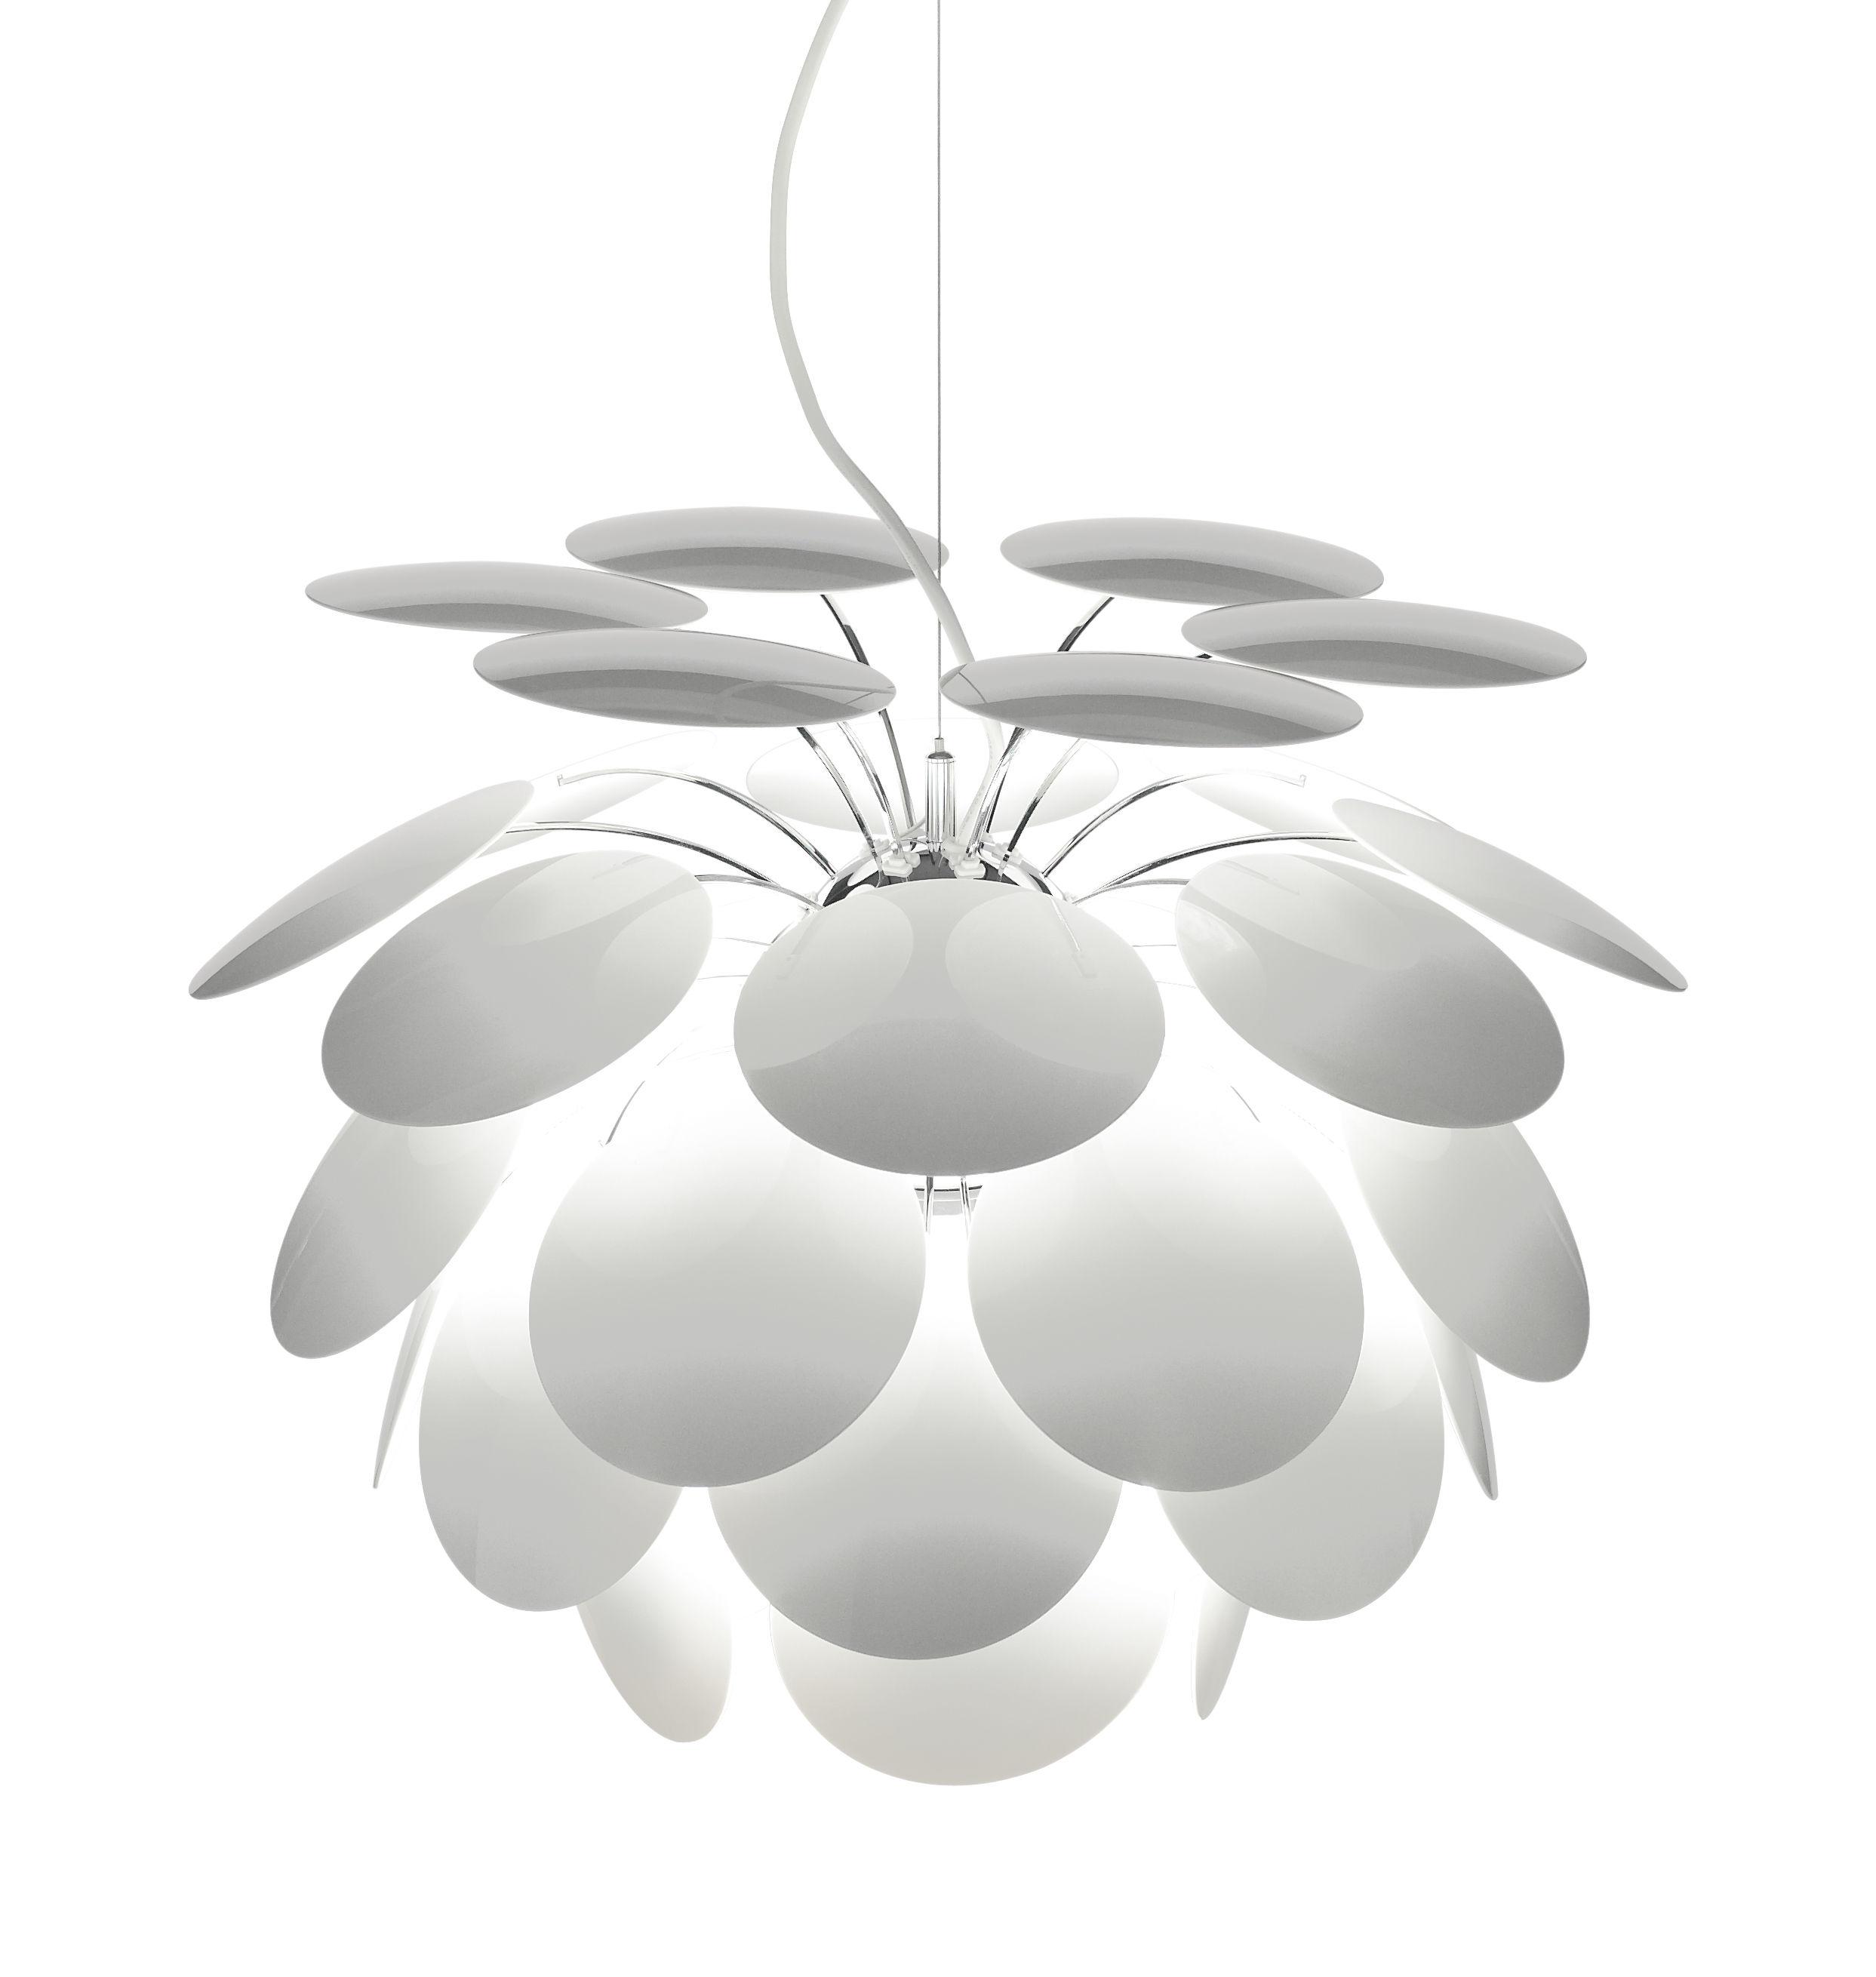 Lighting - Pendant Lighting - Discocó Pendant - Ø 35 cm by Marset - White - ABS